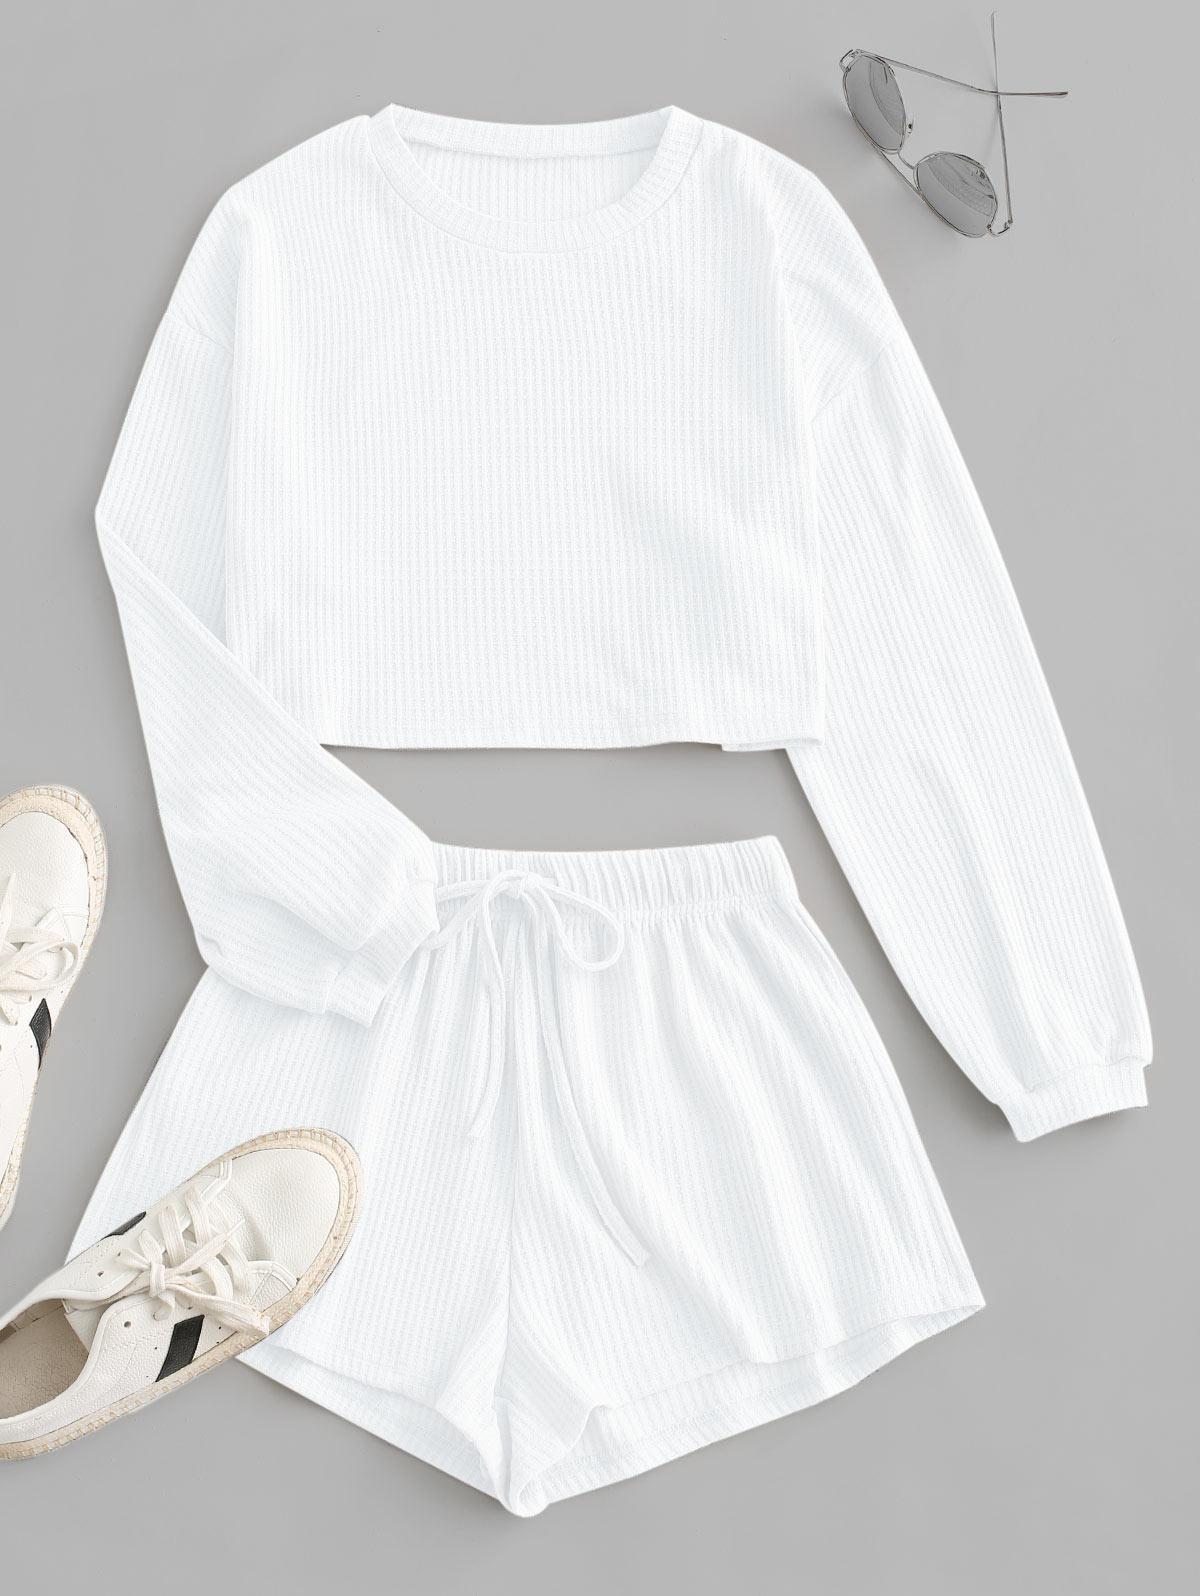 Knitted Drop Shoulder Drawstring Shorts Set